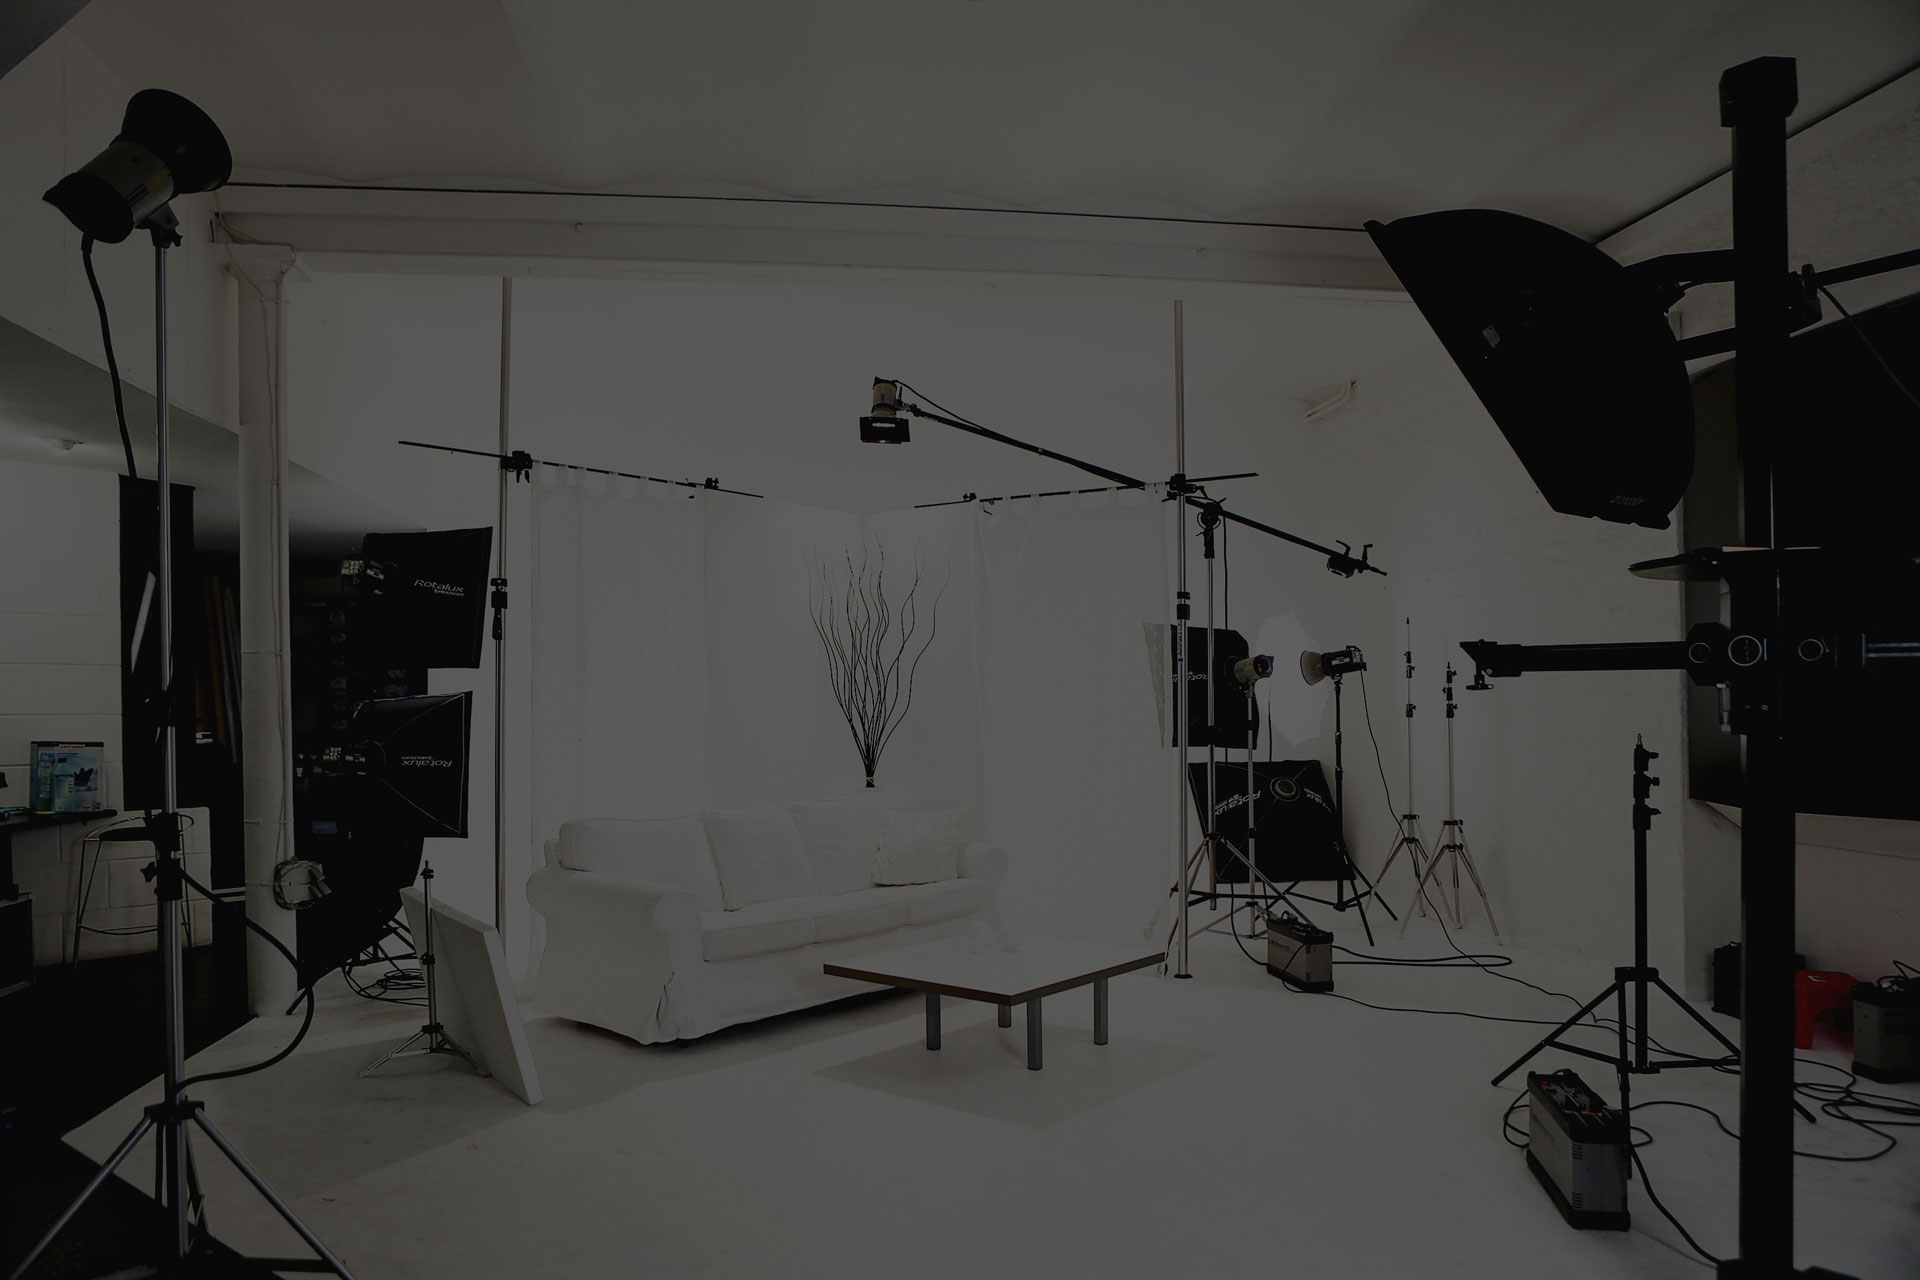 studio stephane francois photographe strasbourg. Black Bedroom Furniture Sets. Home Design Ideas